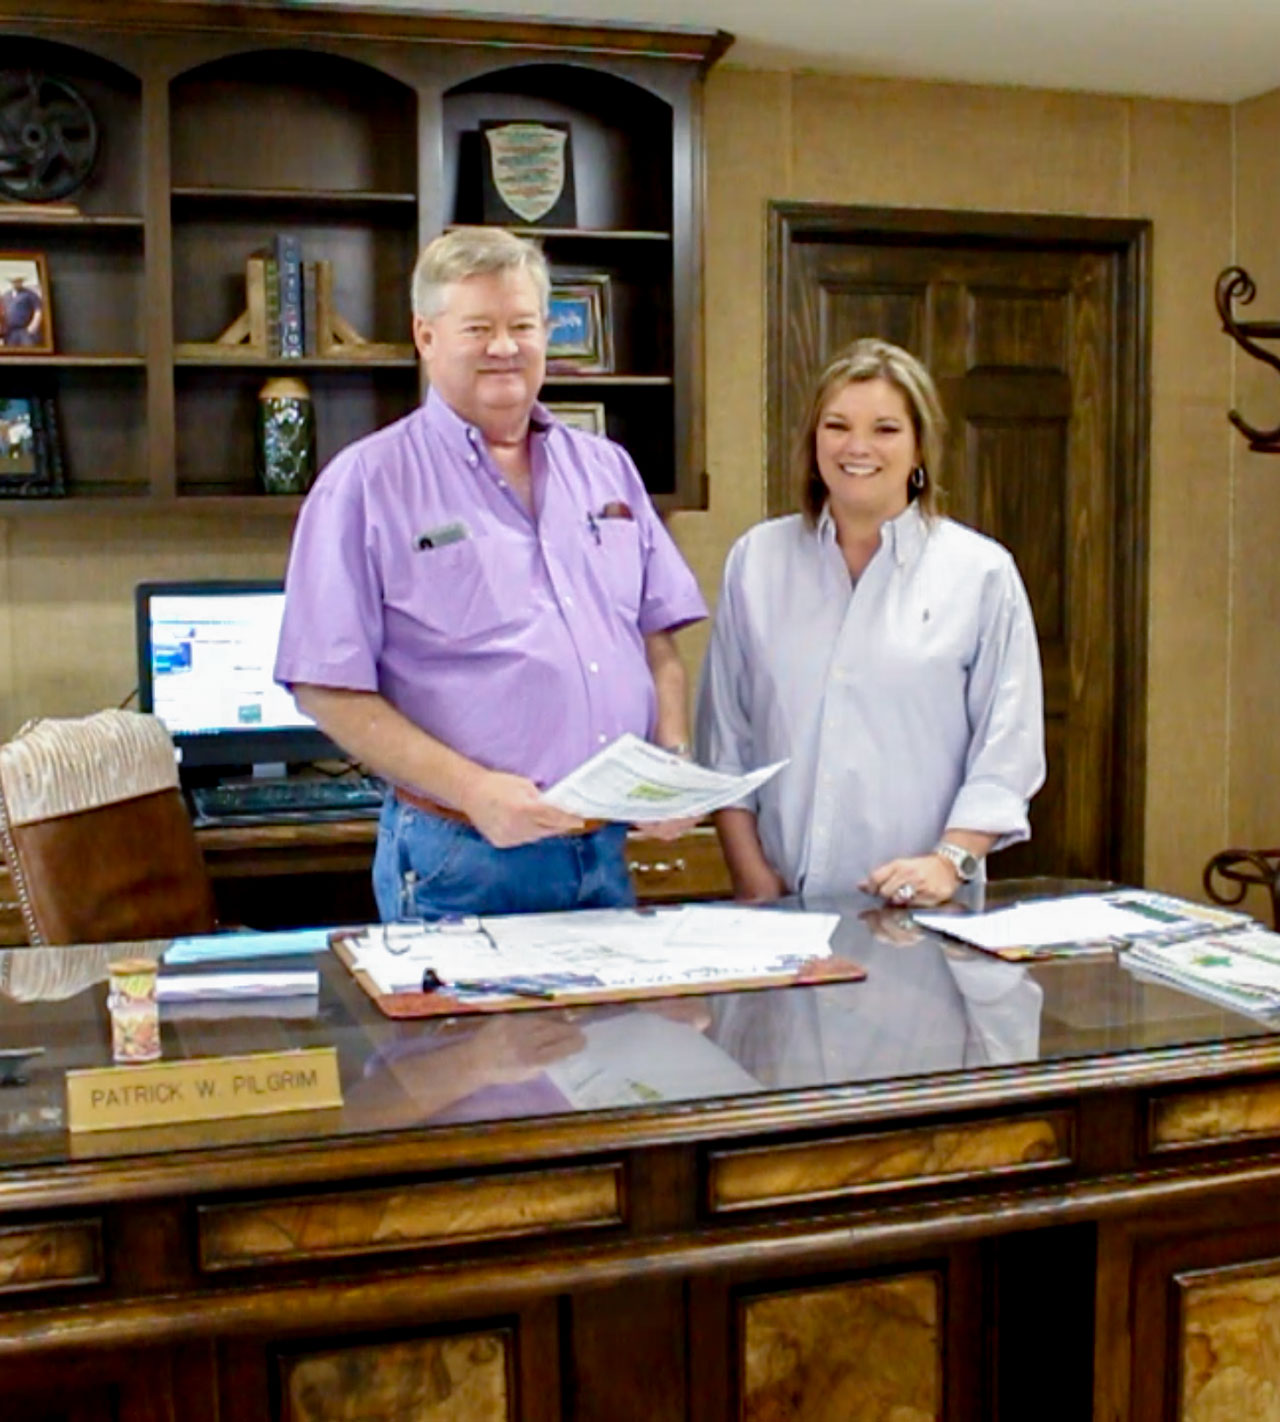 Pat and Anne Pilgrim PPF Story